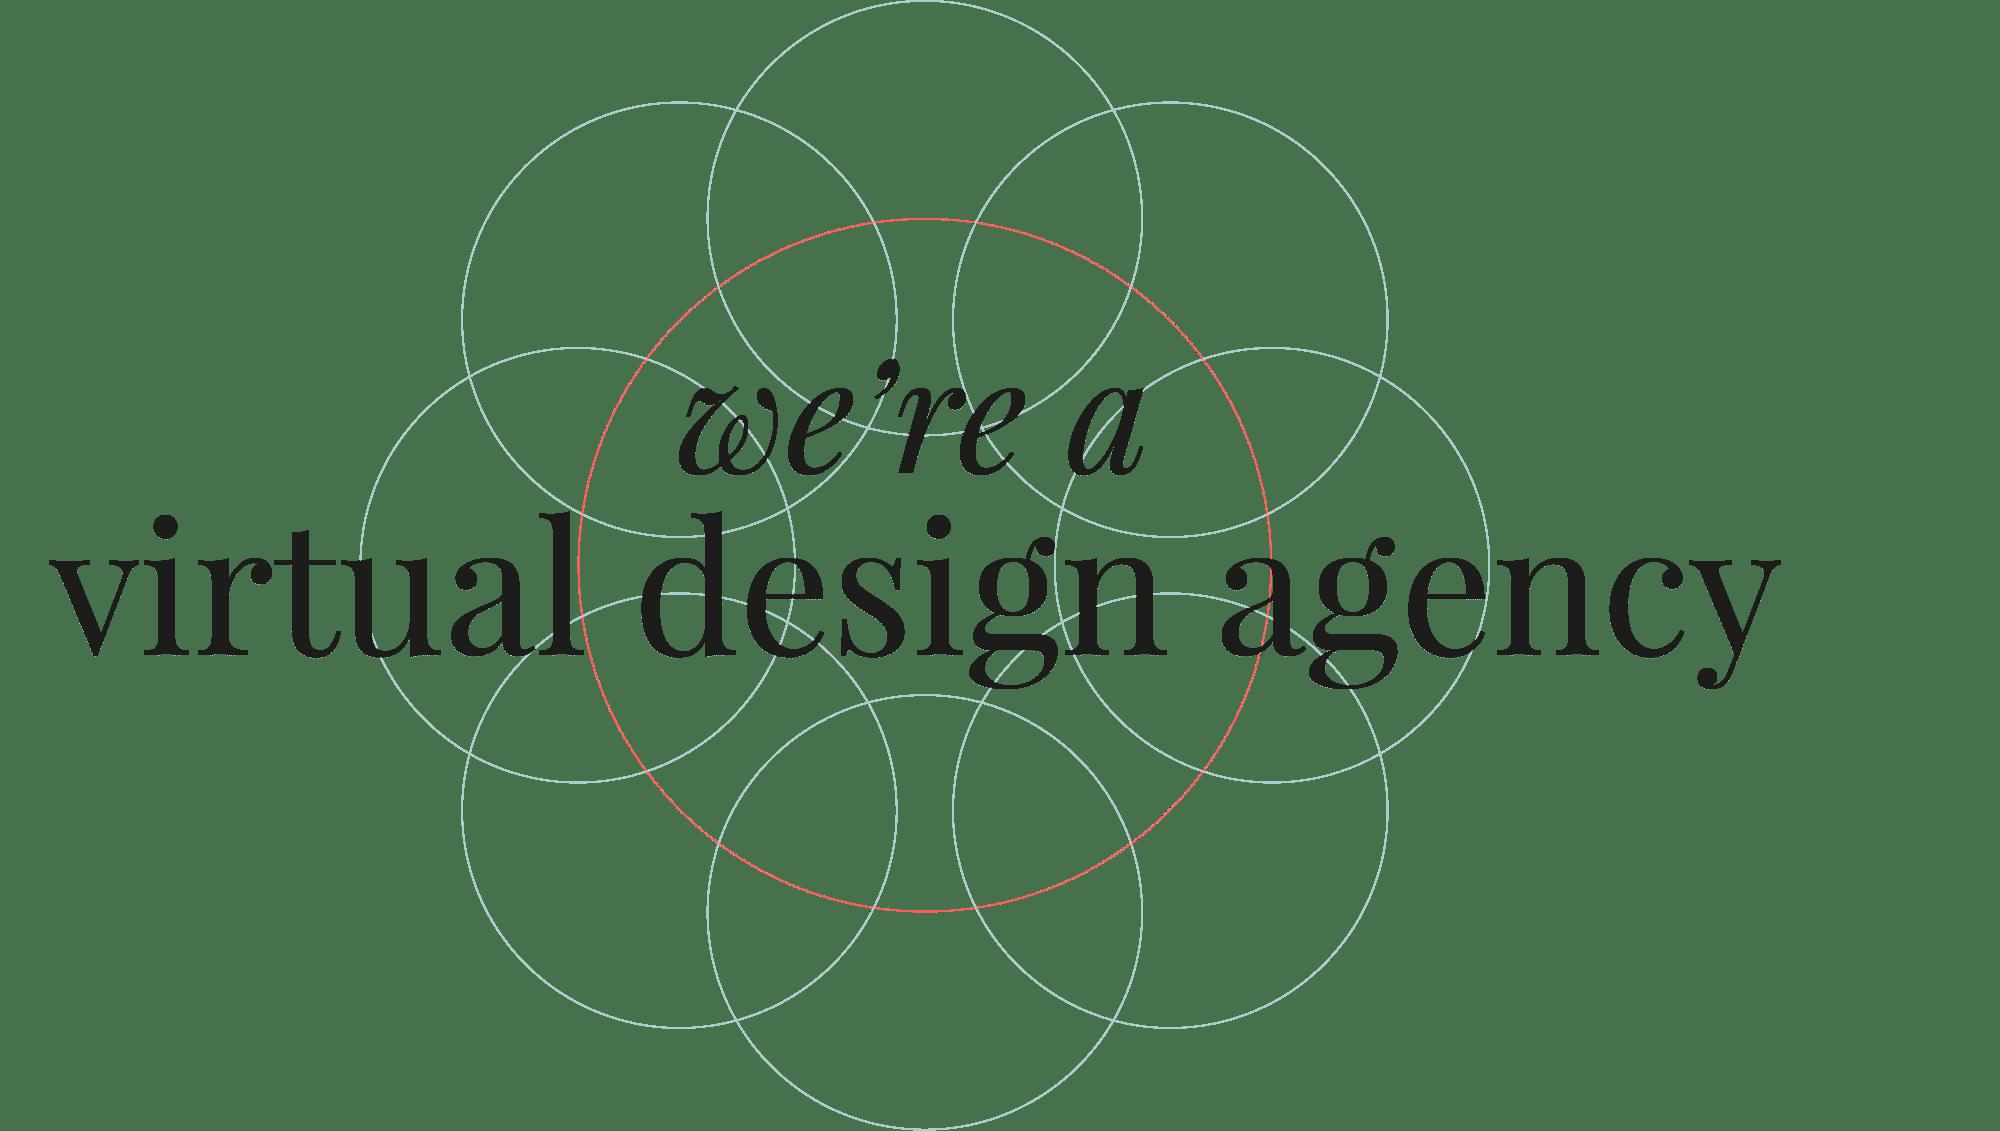 virtual design agency